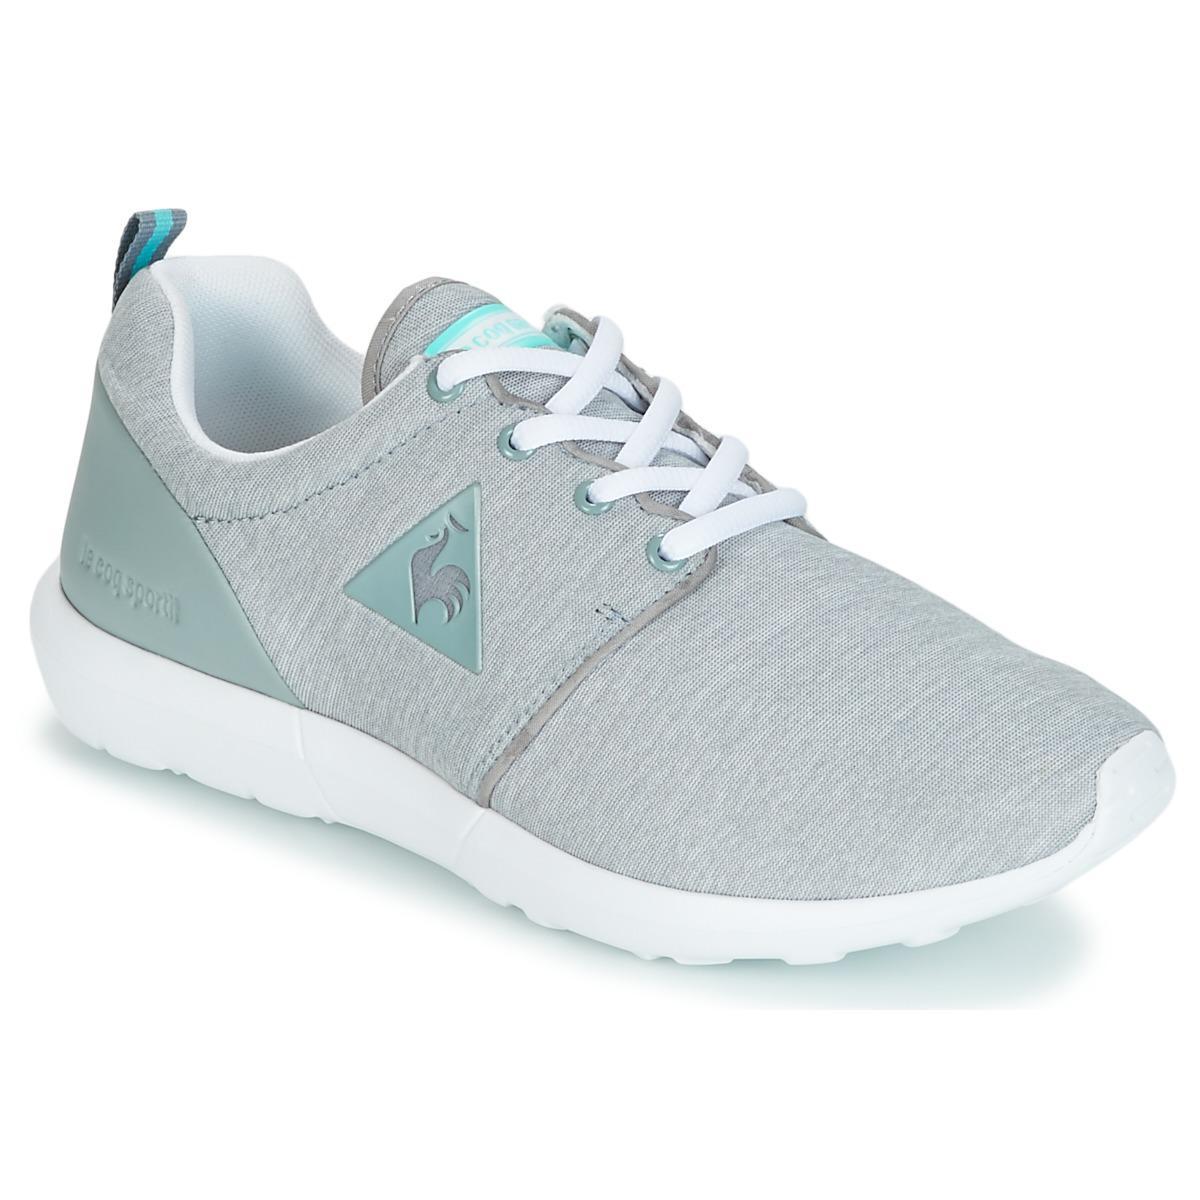 6b91c72b3ff3 Le Coq Sportif Dynacomf W Tech Jersey Shoes (trainers) in Gray - Lyst